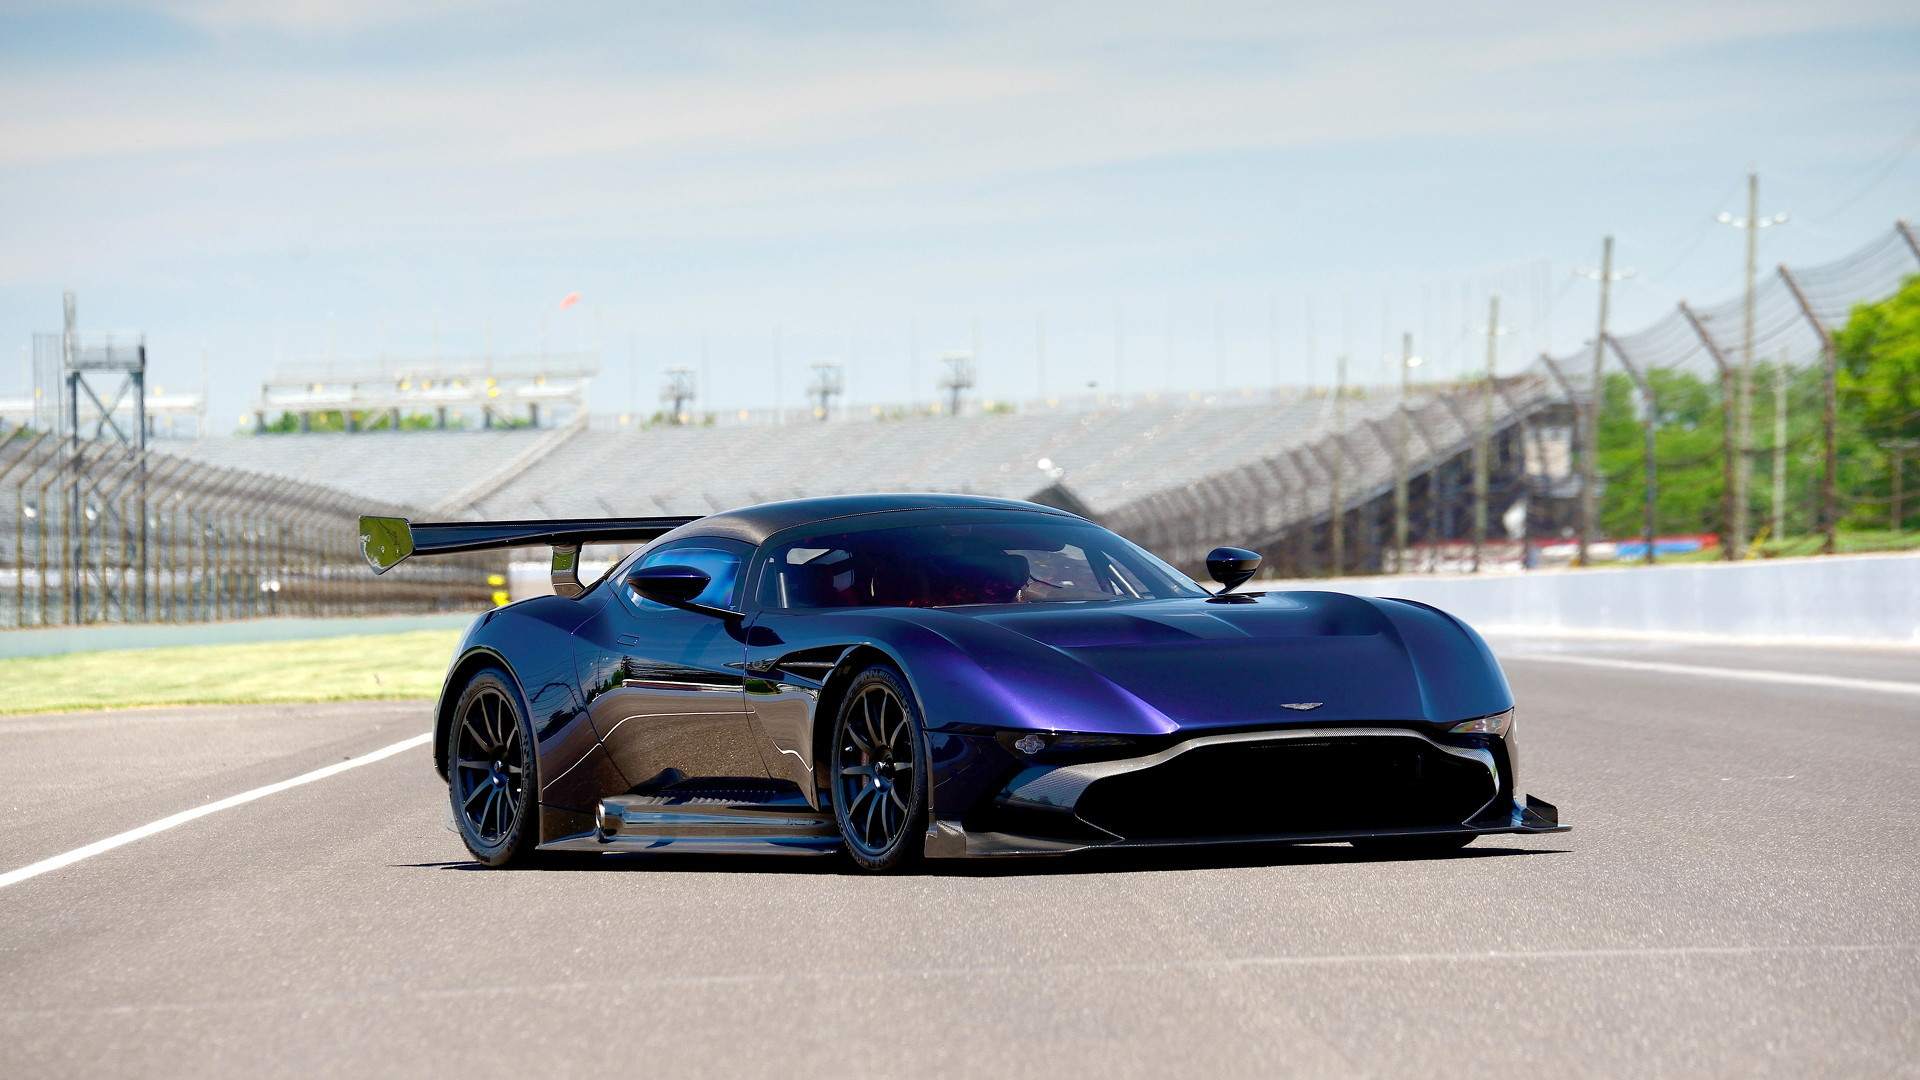 Aston Martin Vulcan - Image via Mecum Auctions